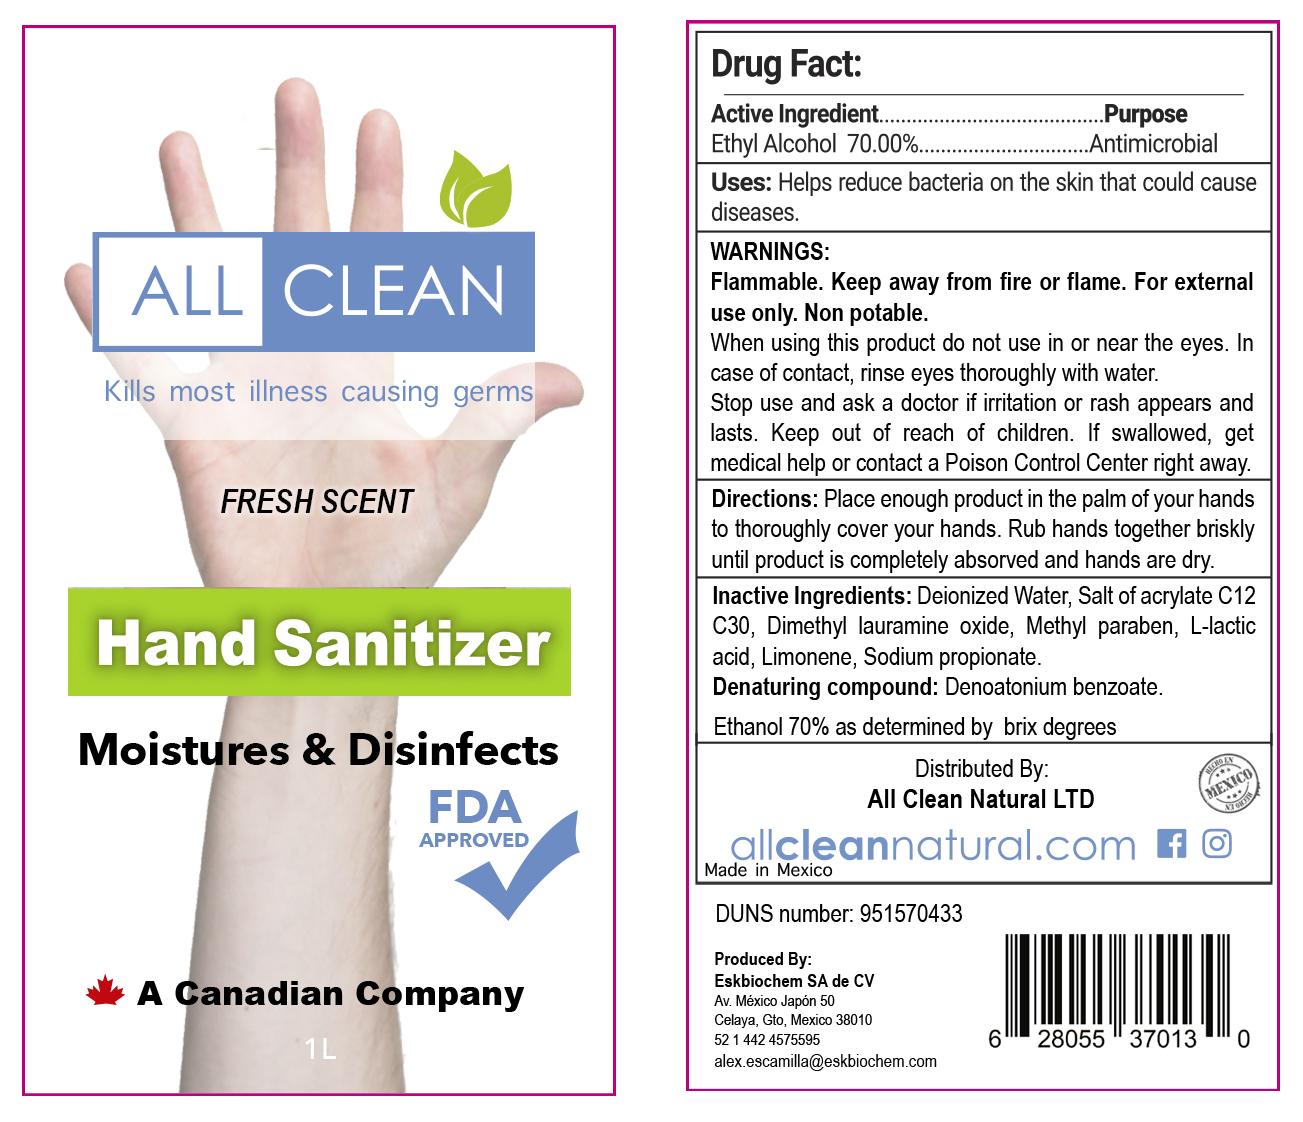 All-Clean Hand Sanitizer